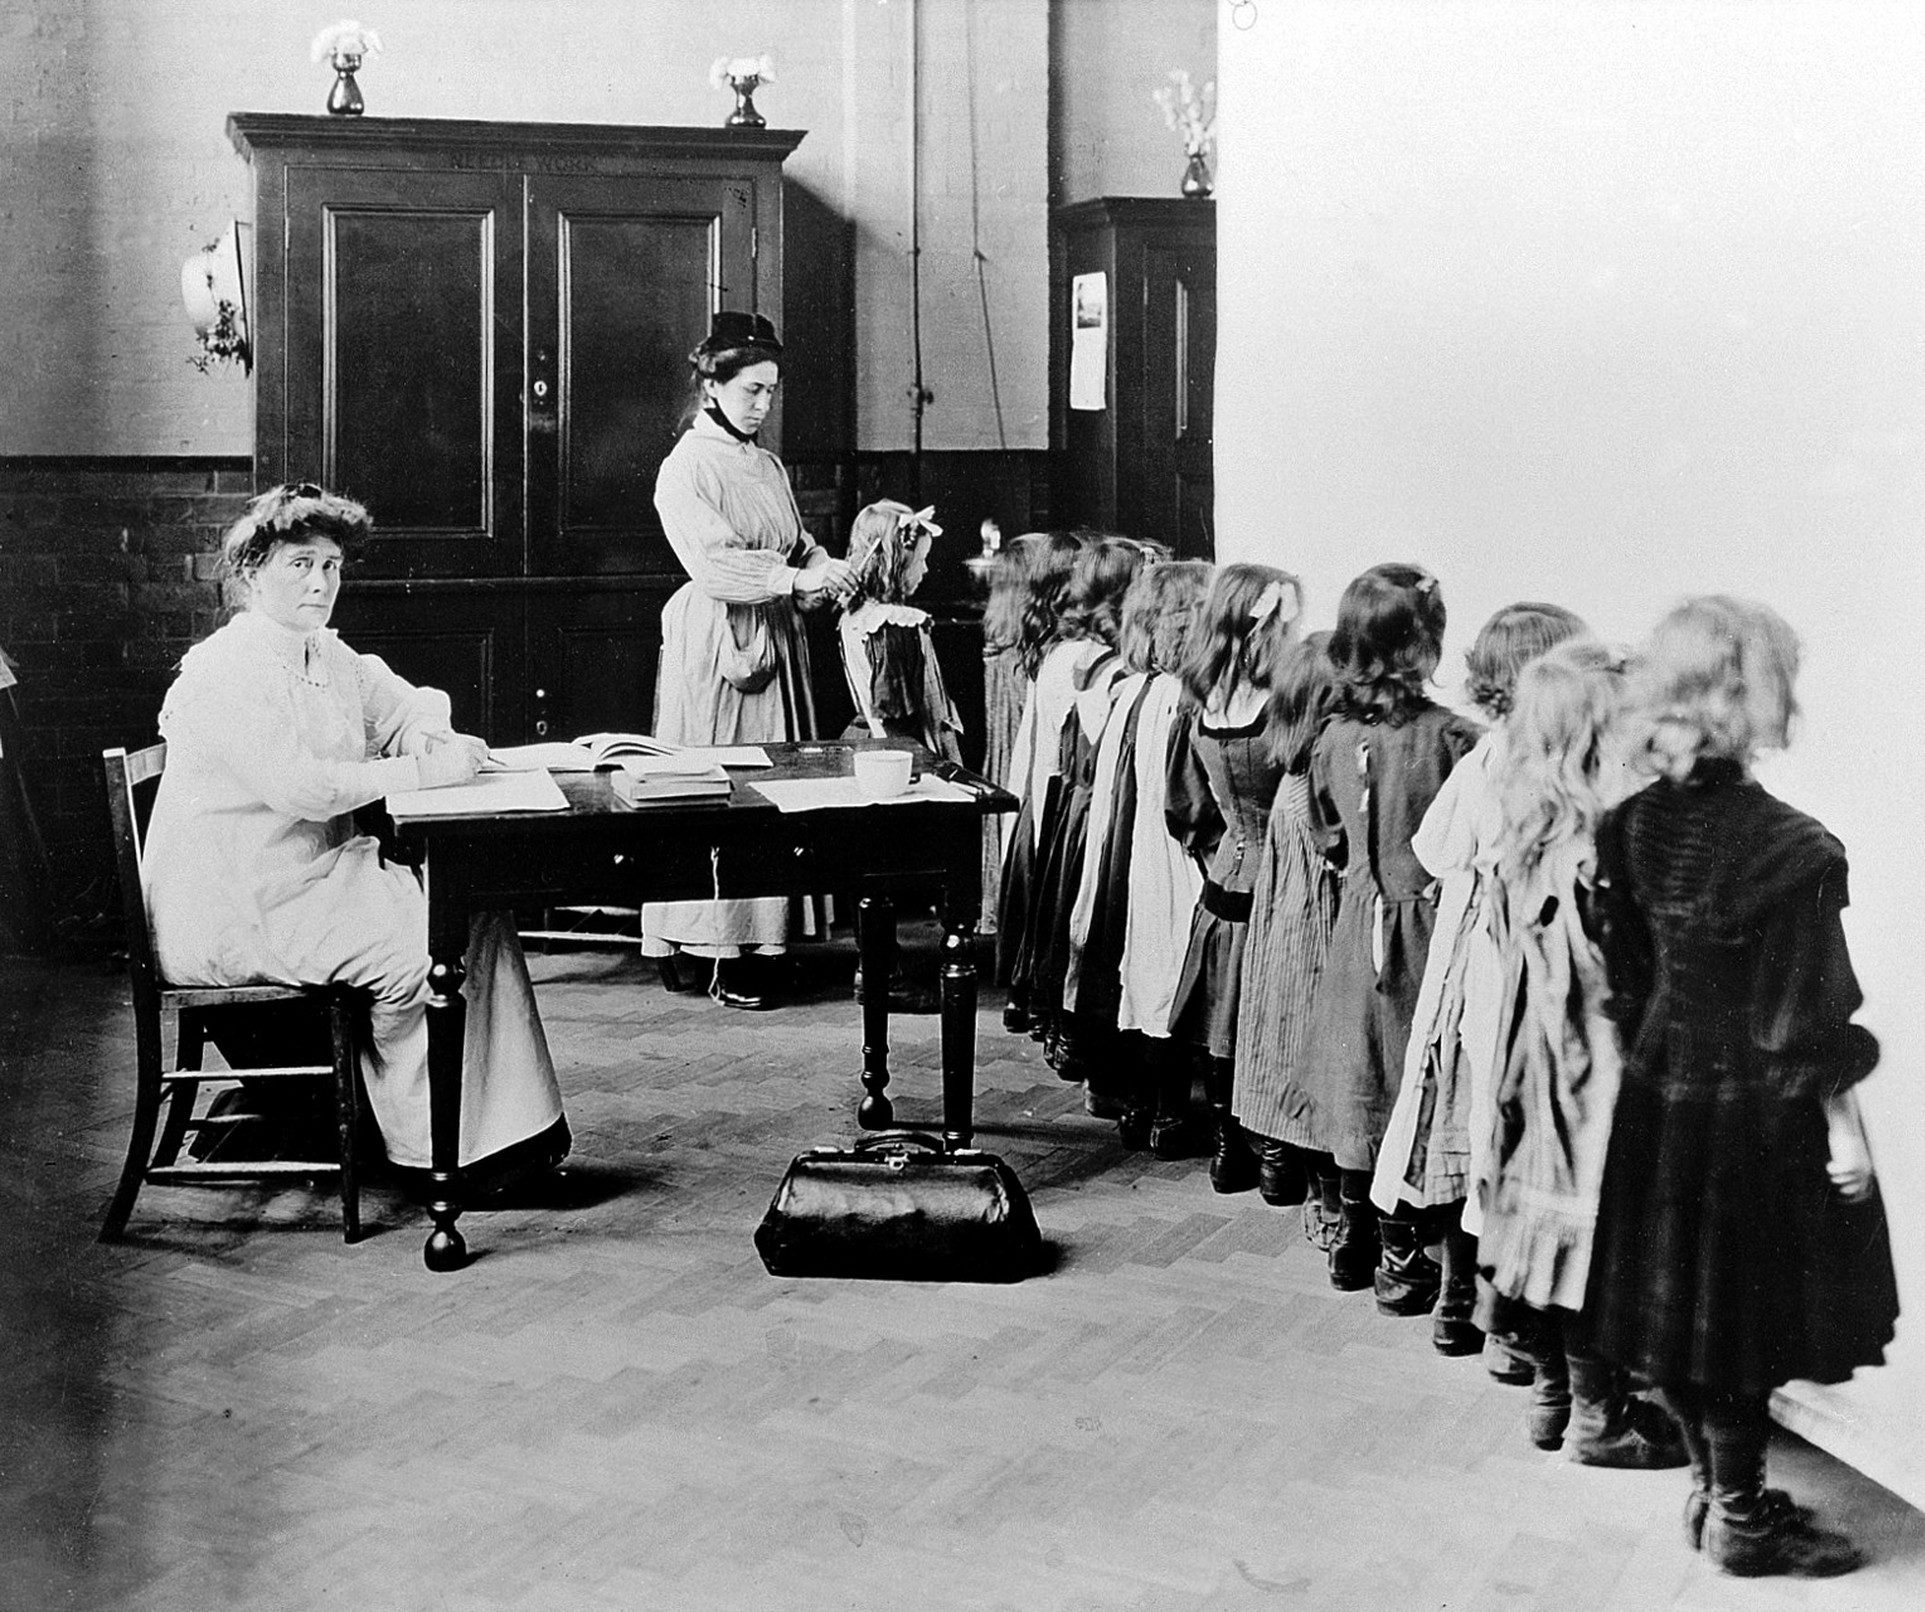 Woman sanitary inspector examining young girls' hair